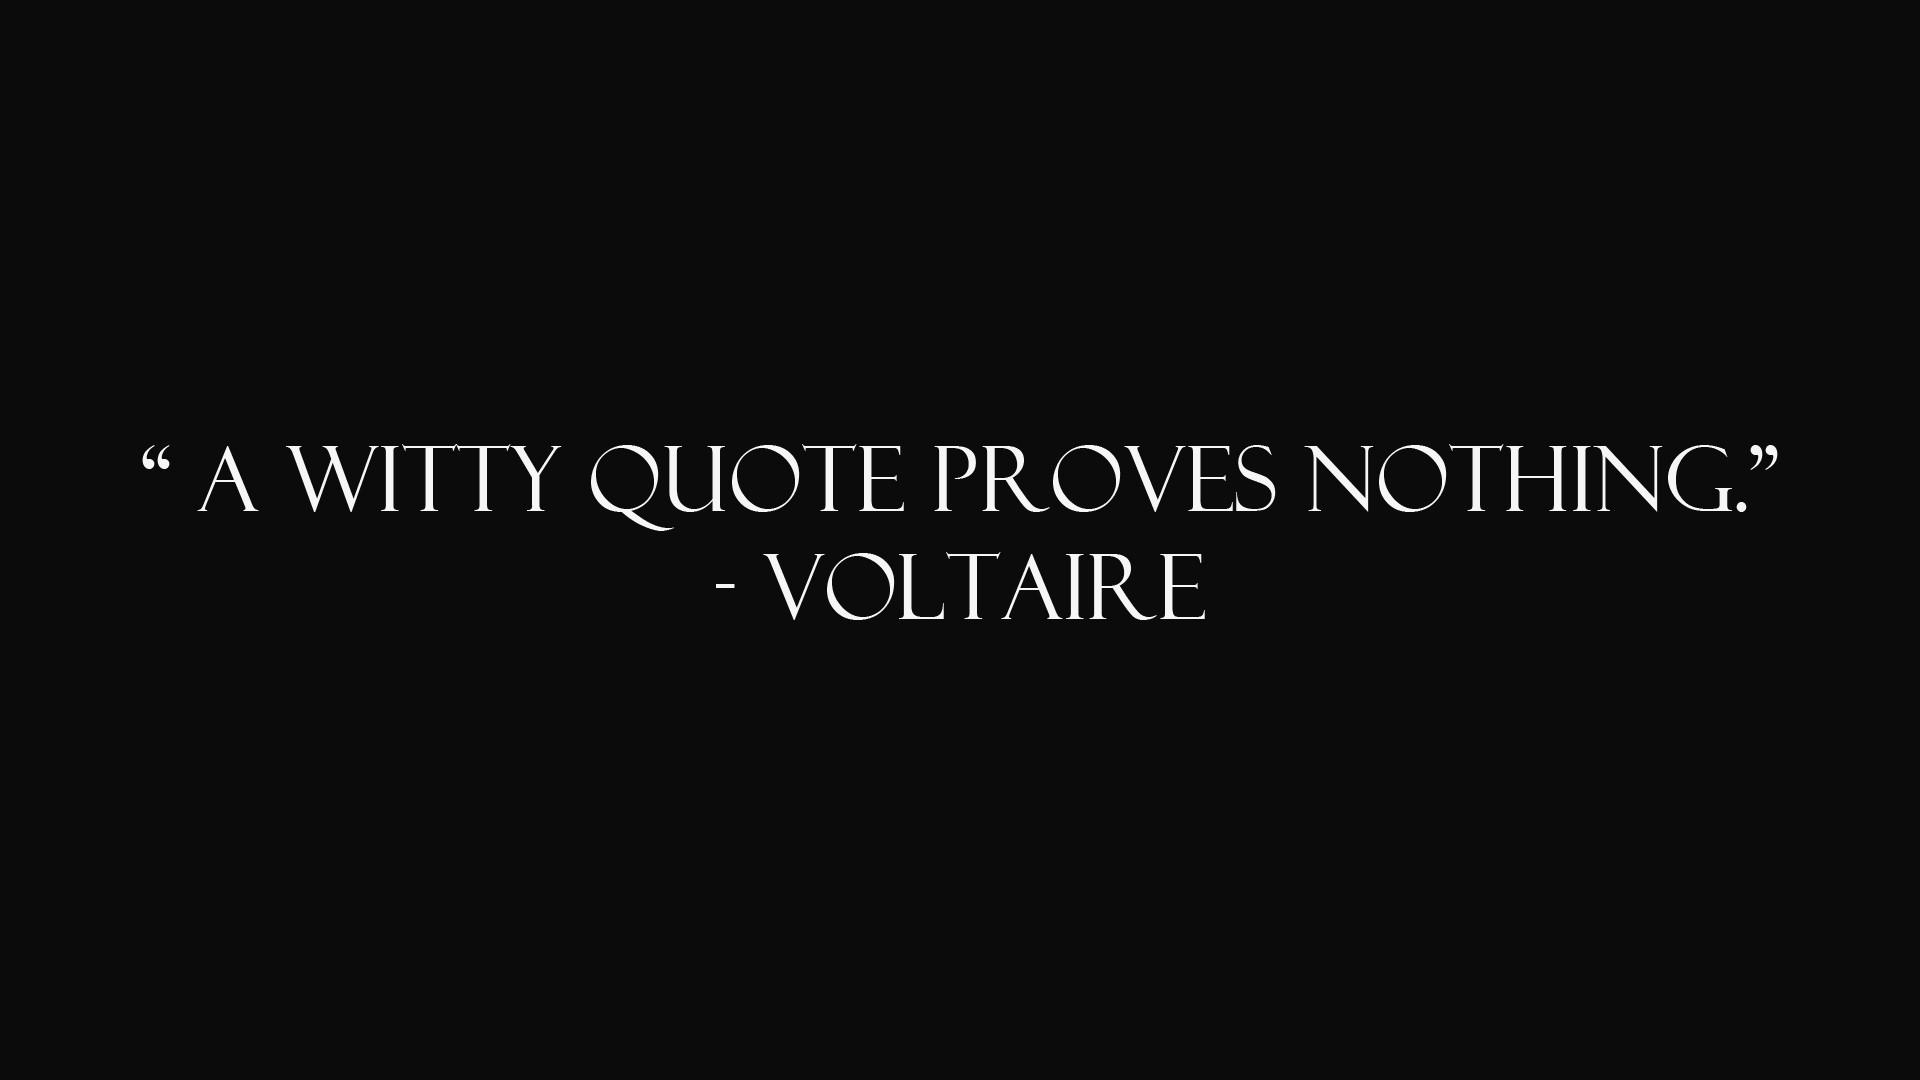 Quotes Voltaire Black Background